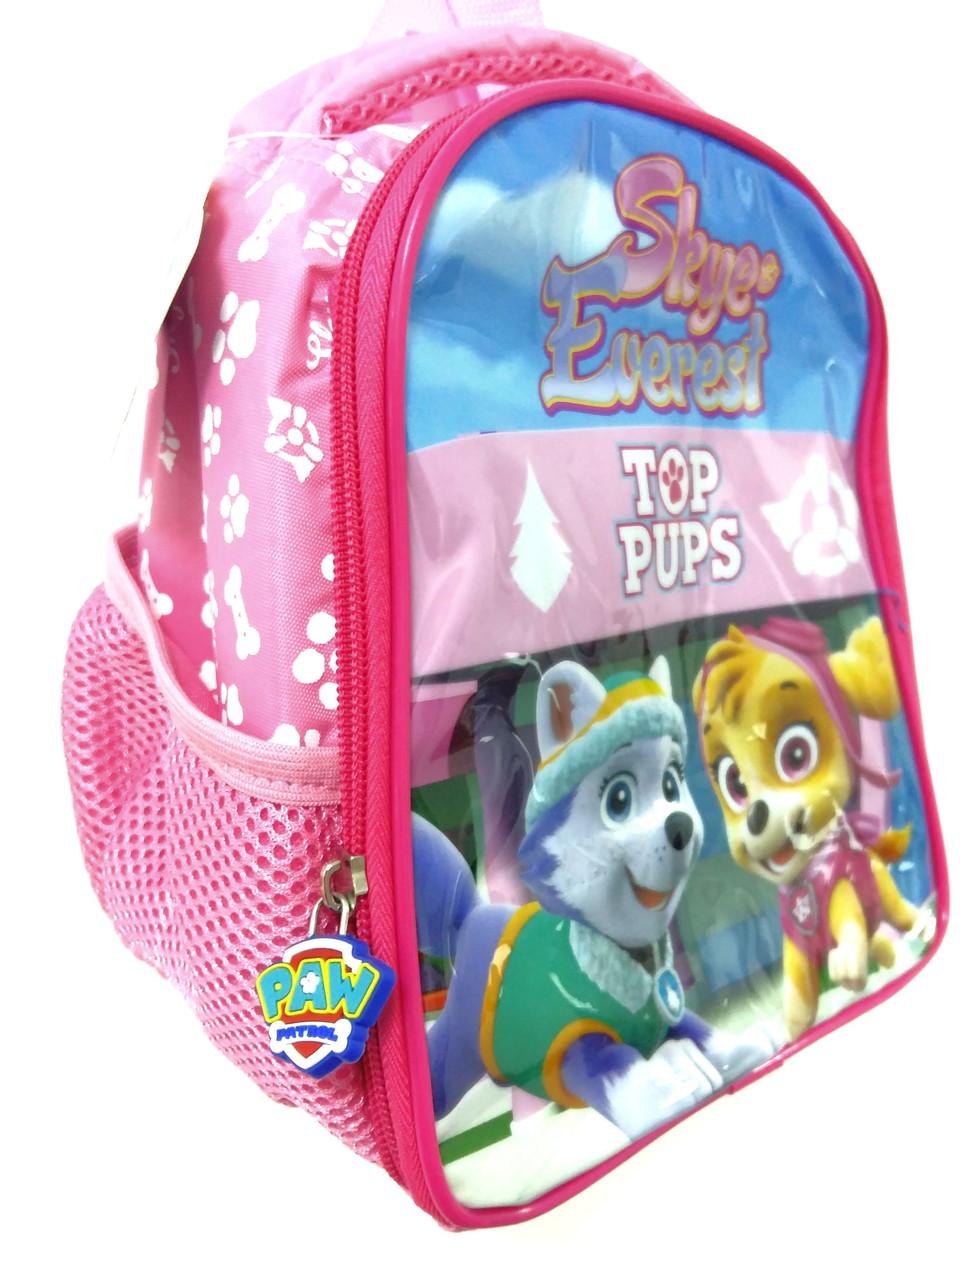 caadf1c15edf Термо-рюкзак для девочки Франция, цена 285 грн., купить в Луцке ...